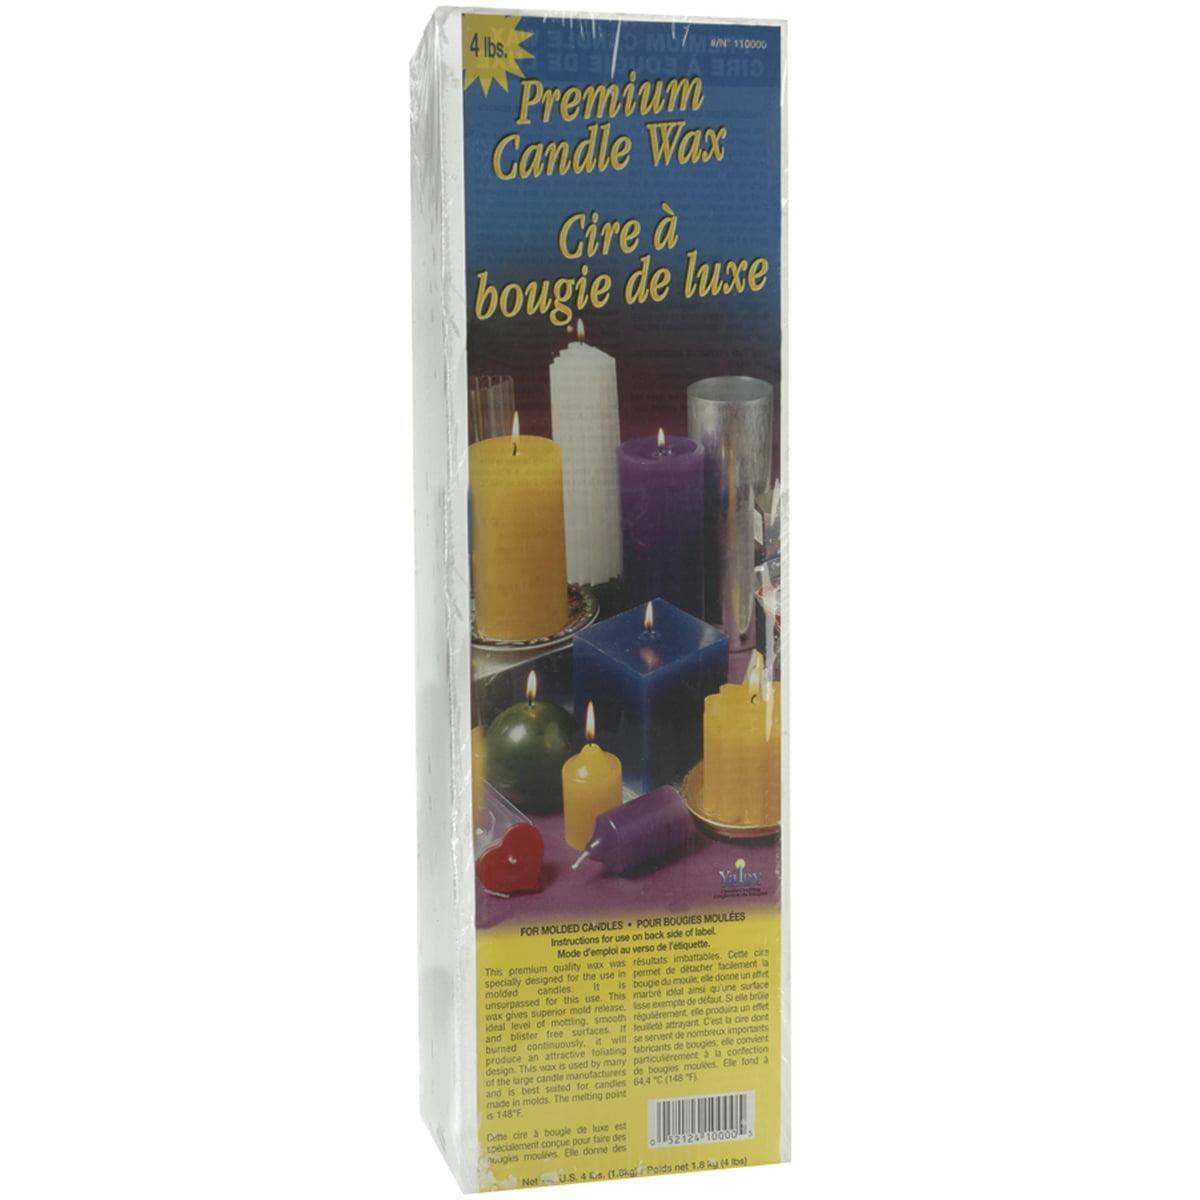 Premium Candle Wax, 4 Pound Block